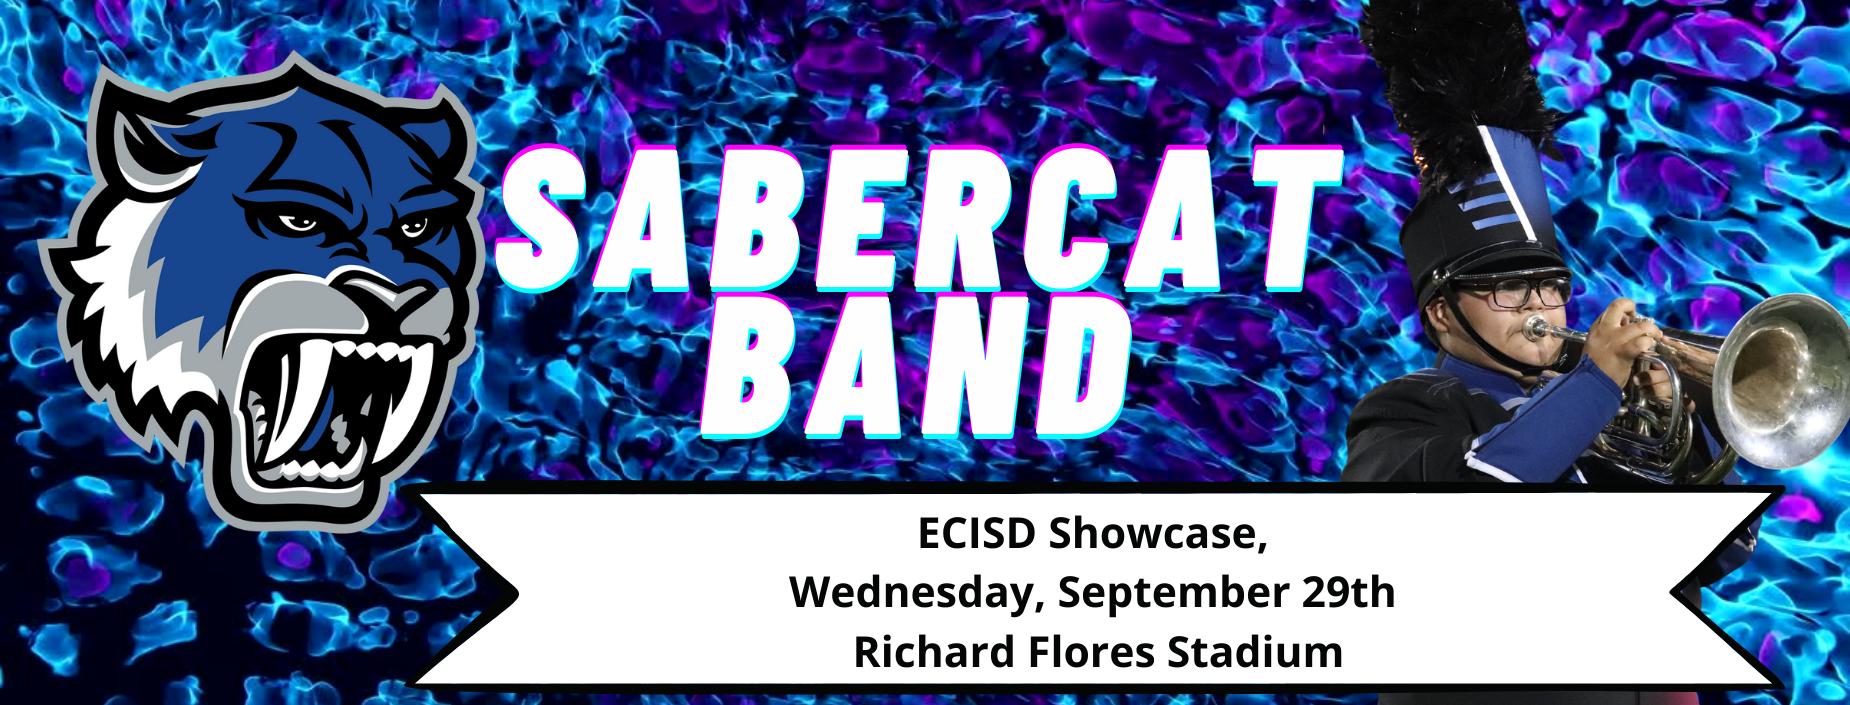 ECISD Showcase Wednesday September 29th Richard Flores Stadium